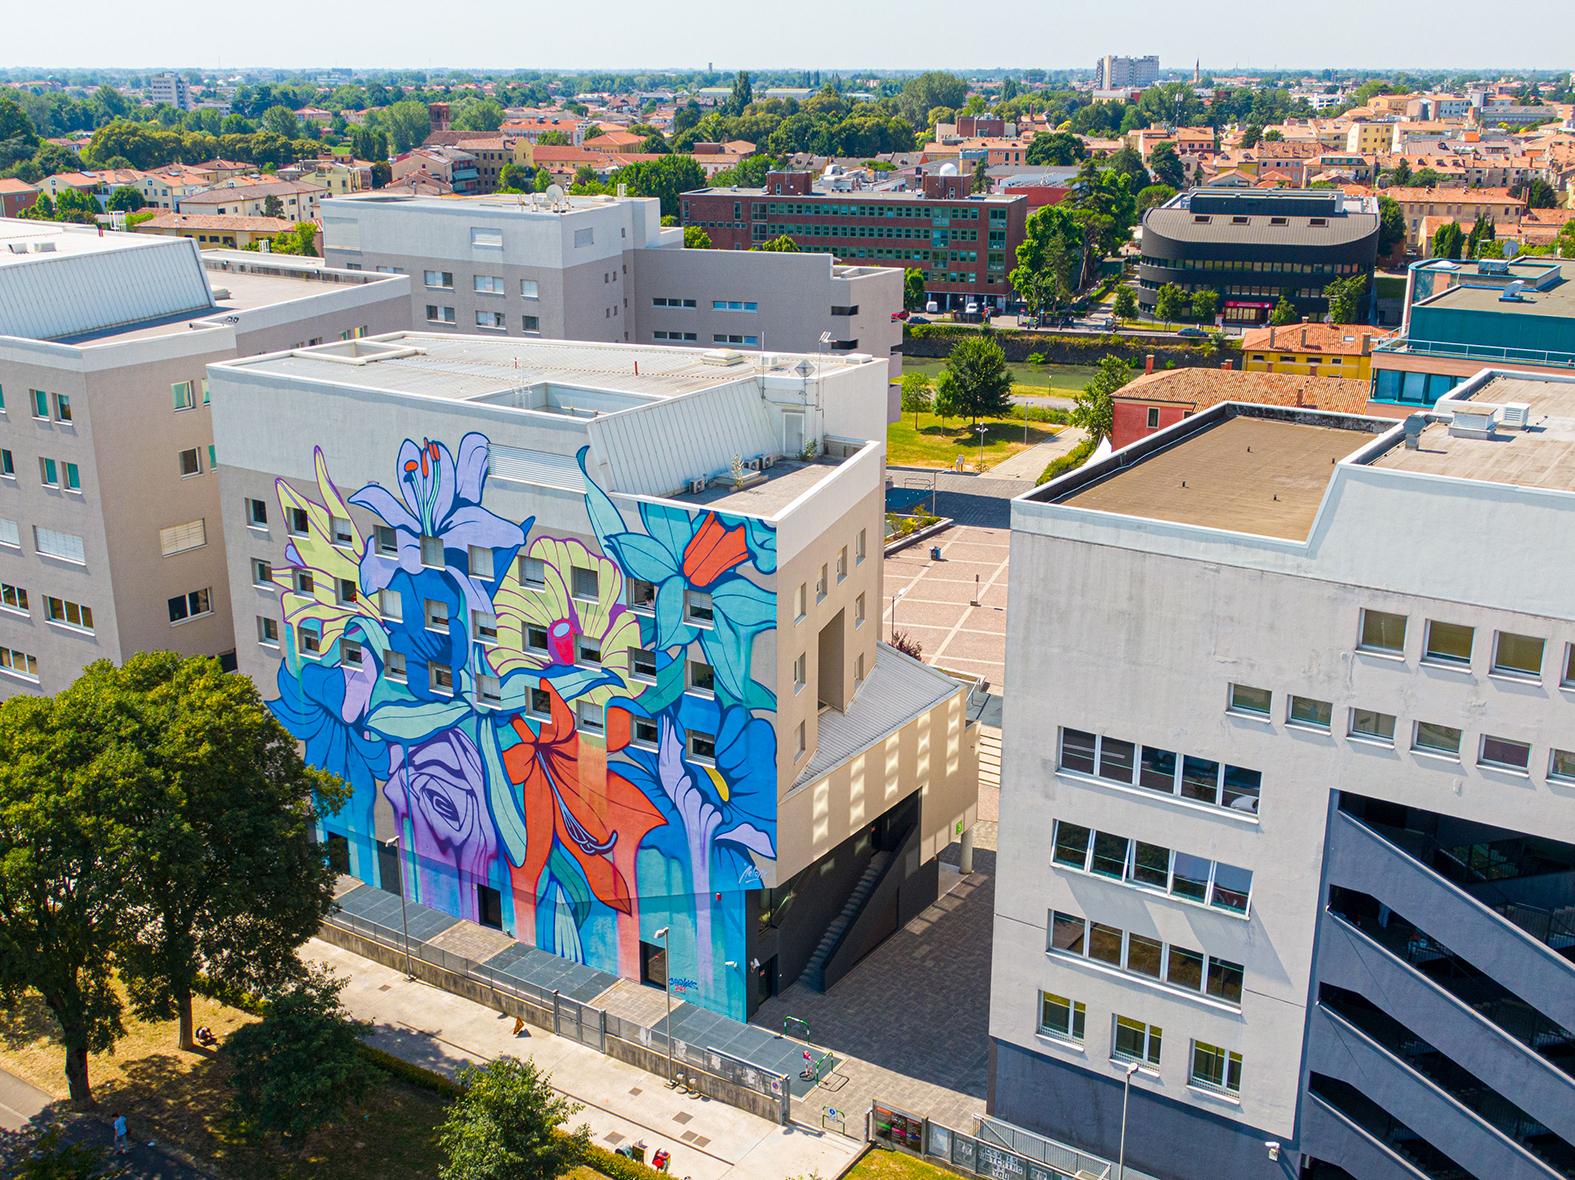 Nerone-superwalls-street-art-padova-15